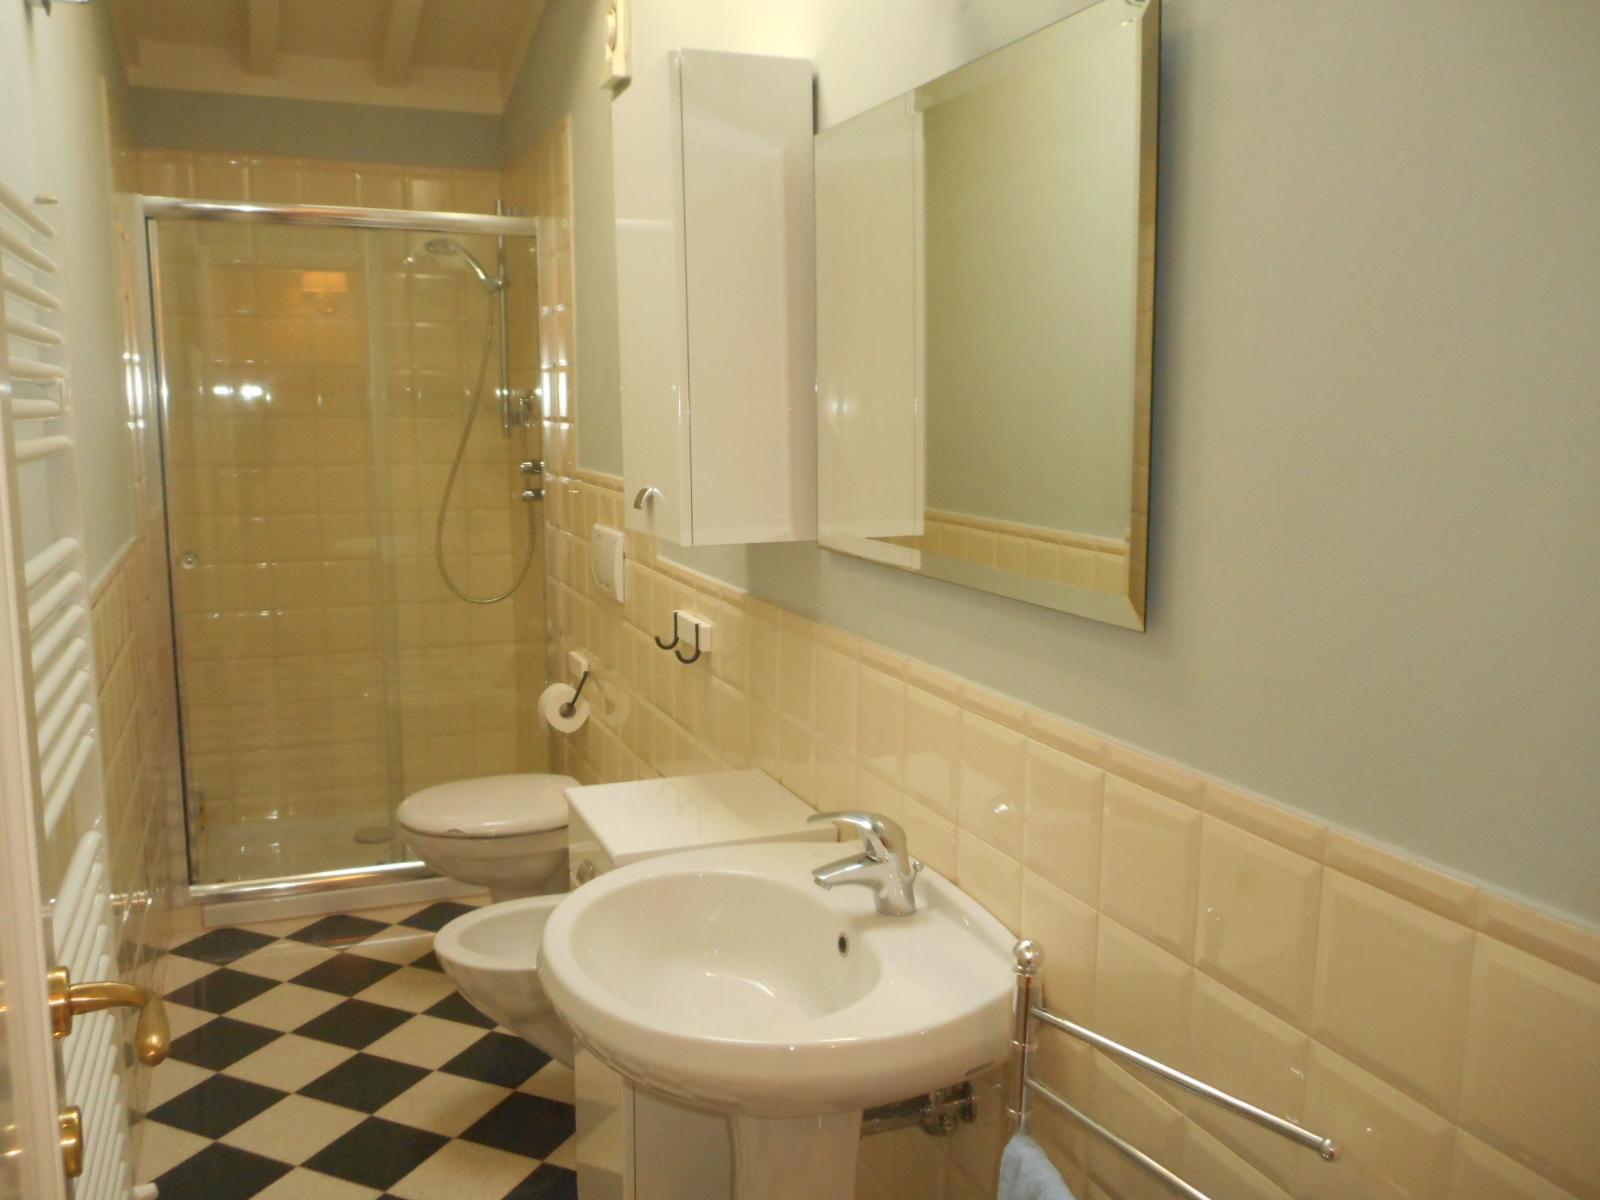 VICINANZE CENTRO,PISTOIA,51100,3 Bedrooms Bedrooms,2 BathroomsBathrooms,Appartamento,VICINANZE CENTRO,1505